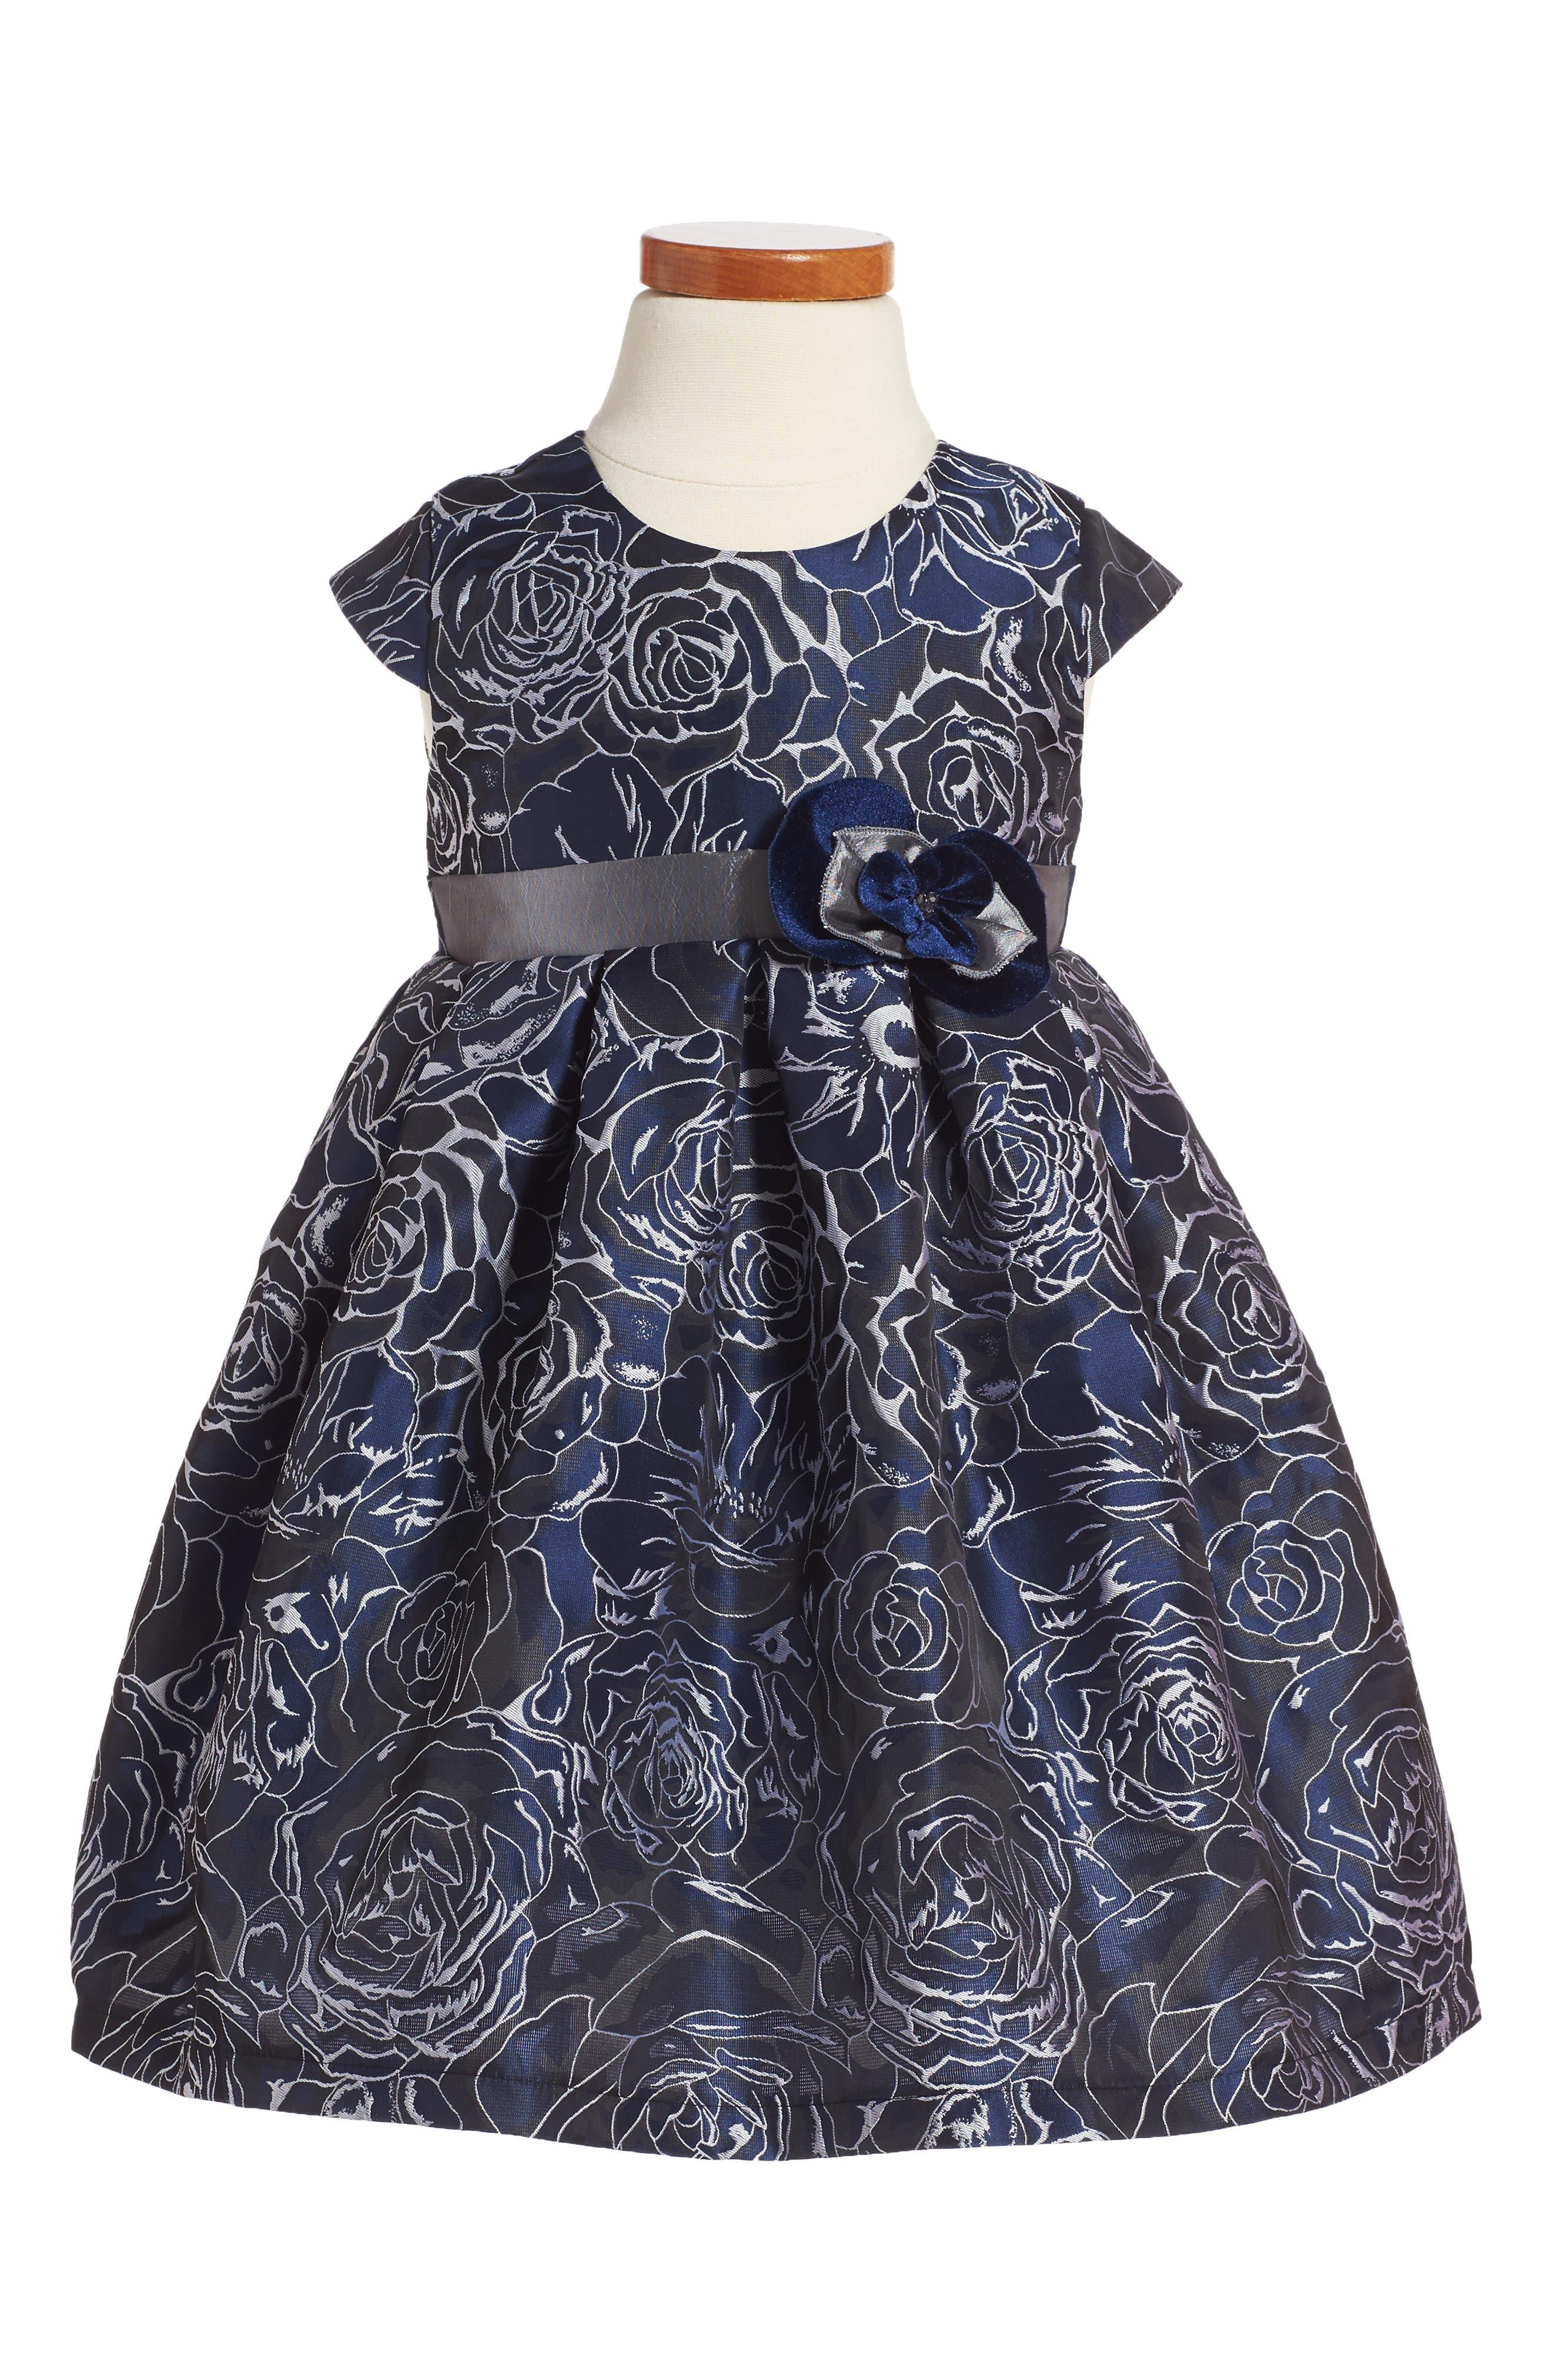 ISOBELLA & CHLOE Floral Jacquard Dress